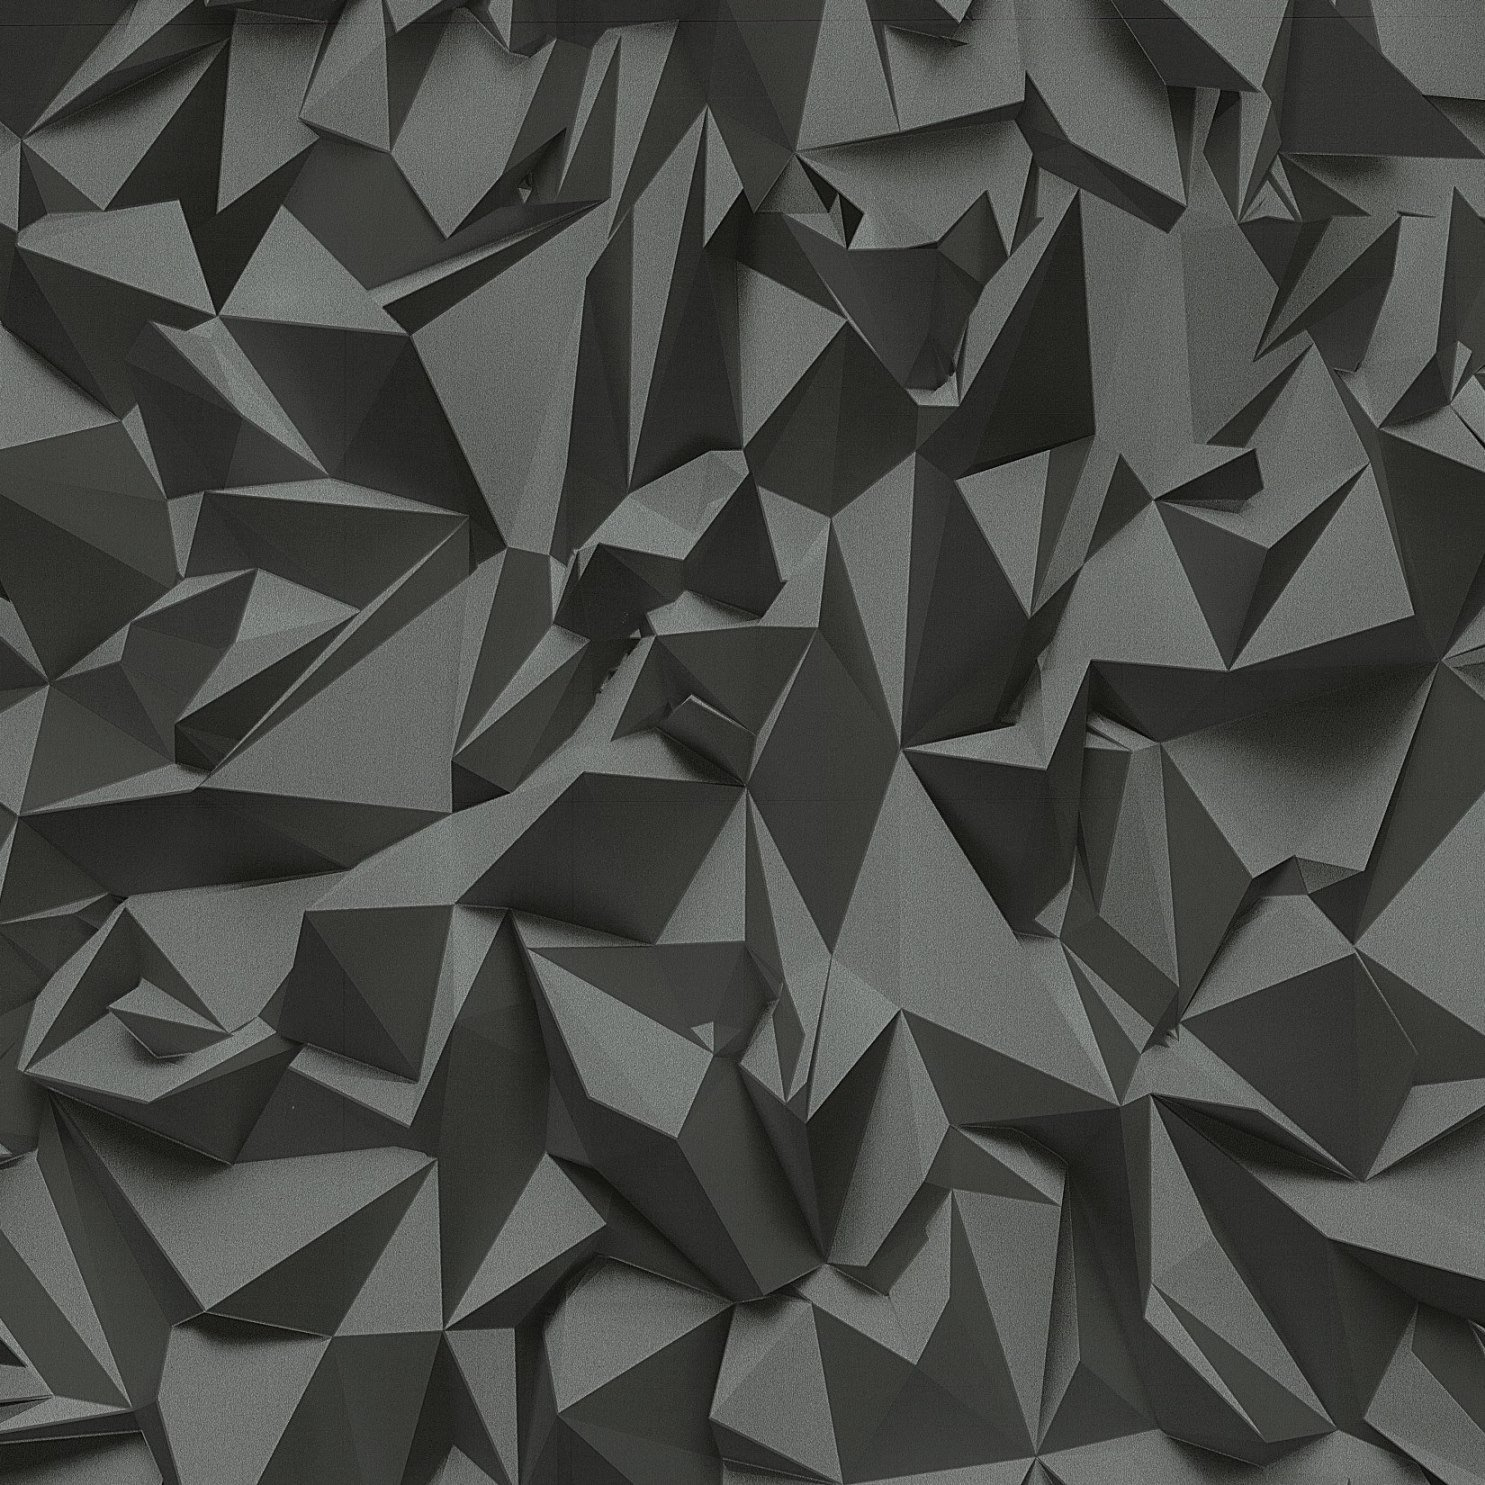 3D Effect Black Silver Futuristic Metallic Vinyl Wallpaper Amazon